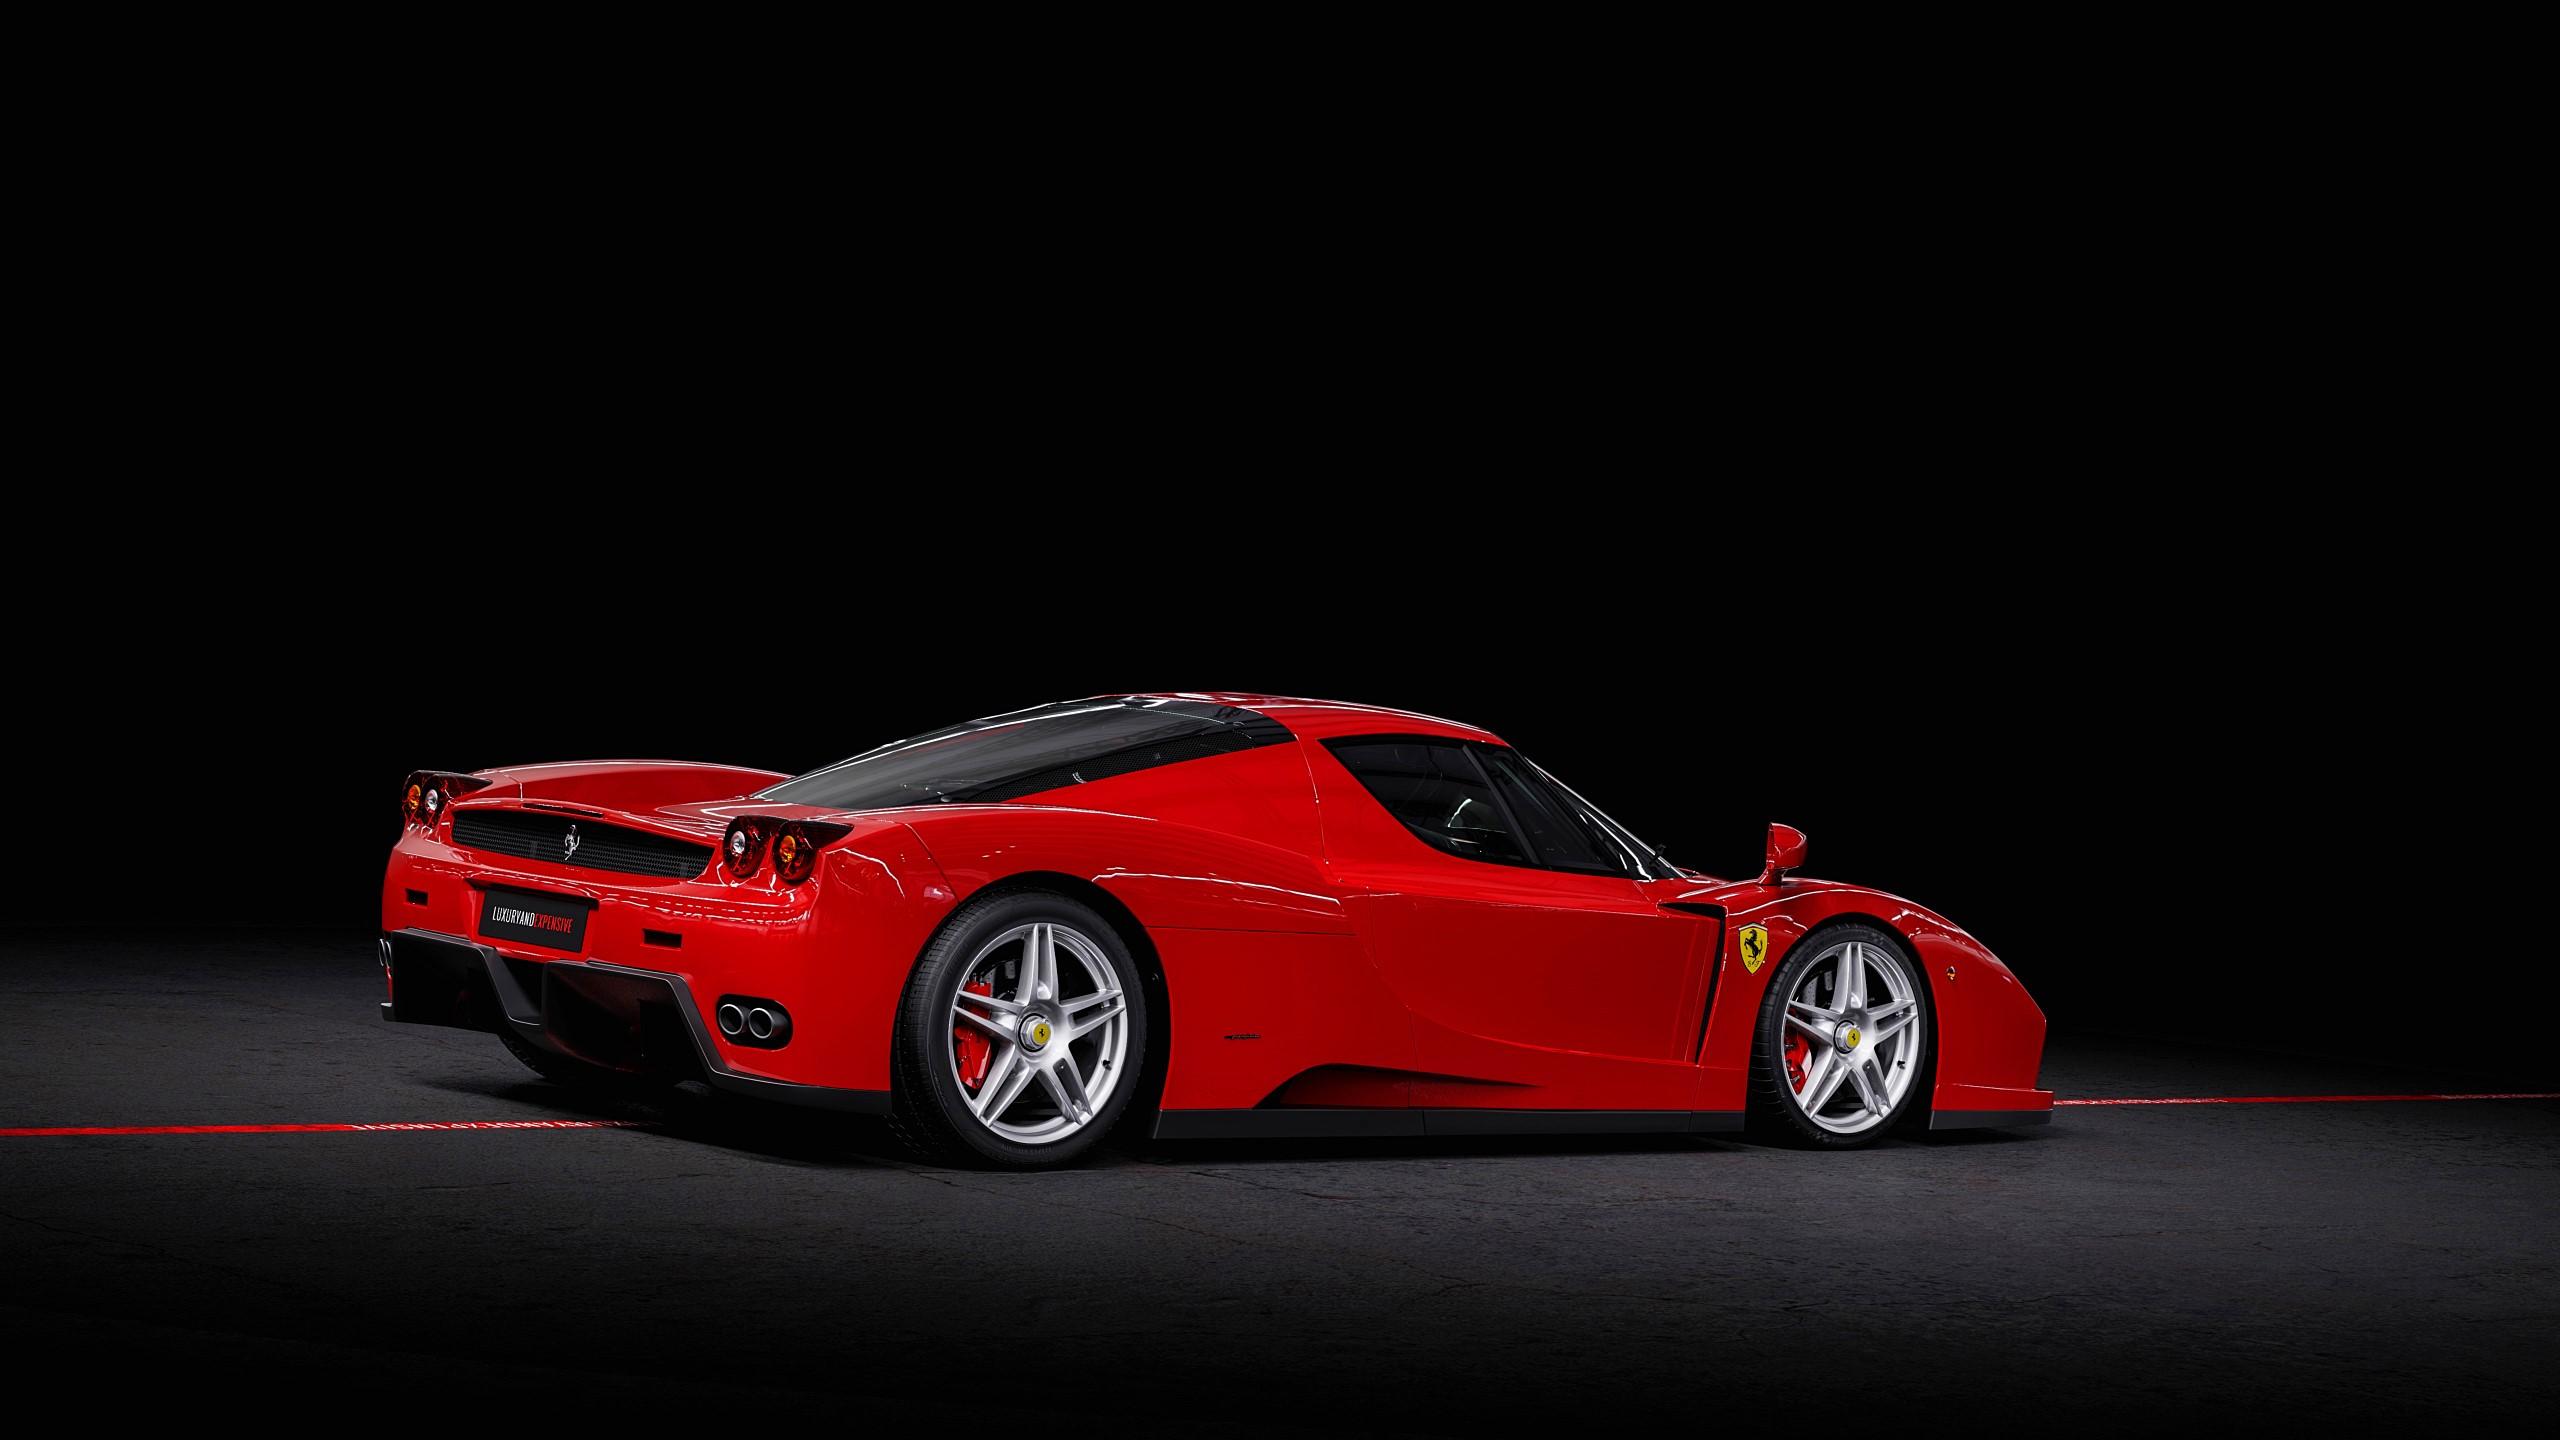 Ferrari Enzo Red In Stock 10 000 Km For Sale